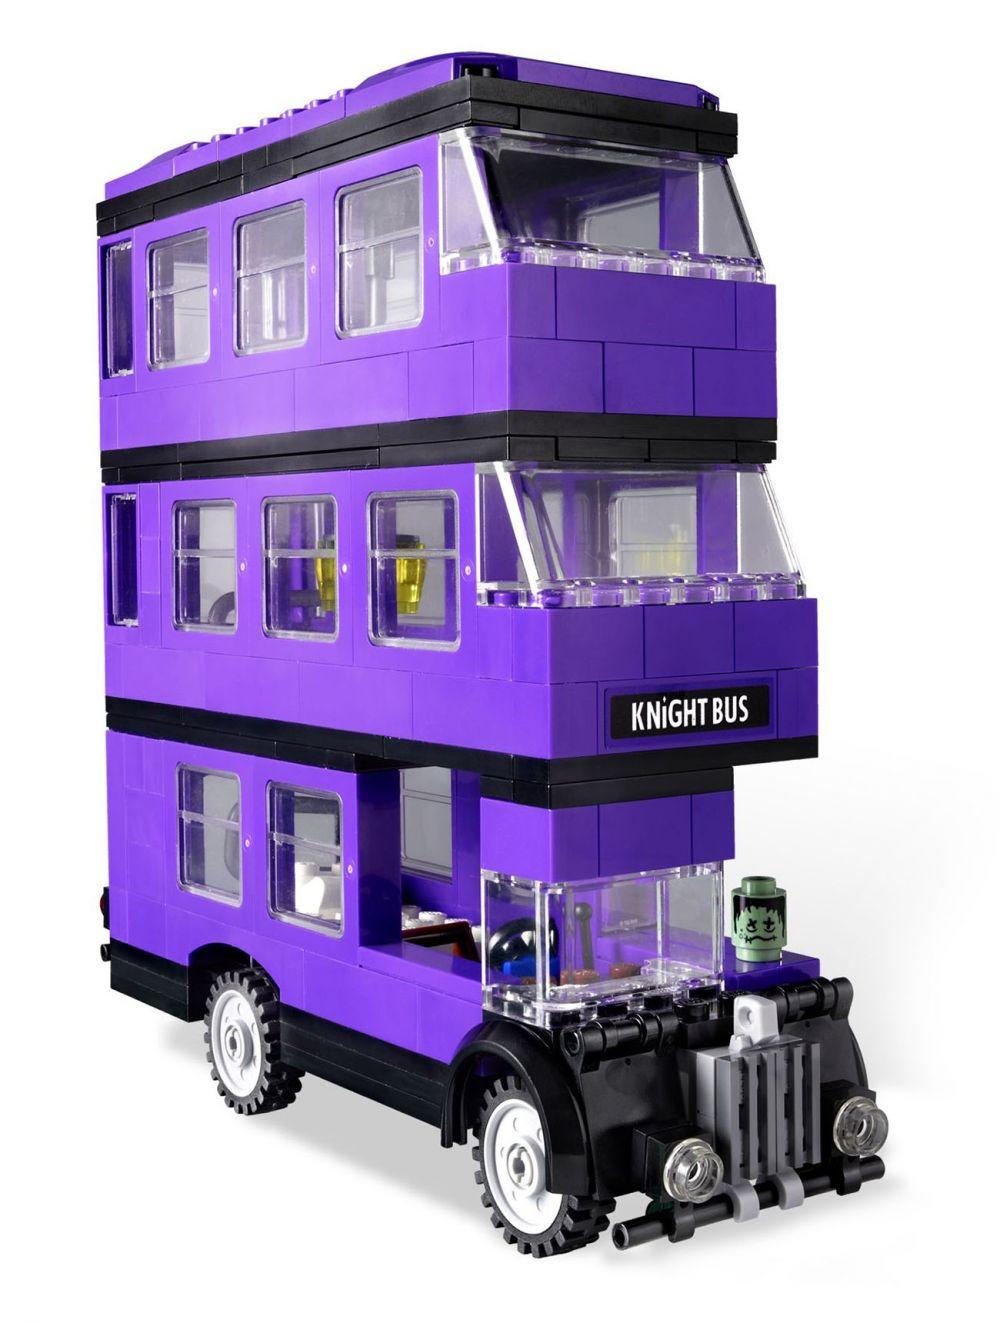 lego harry potter 4866 pas cher le magicobus. Black Bedroom Furniture Sets. Home Design Ideas